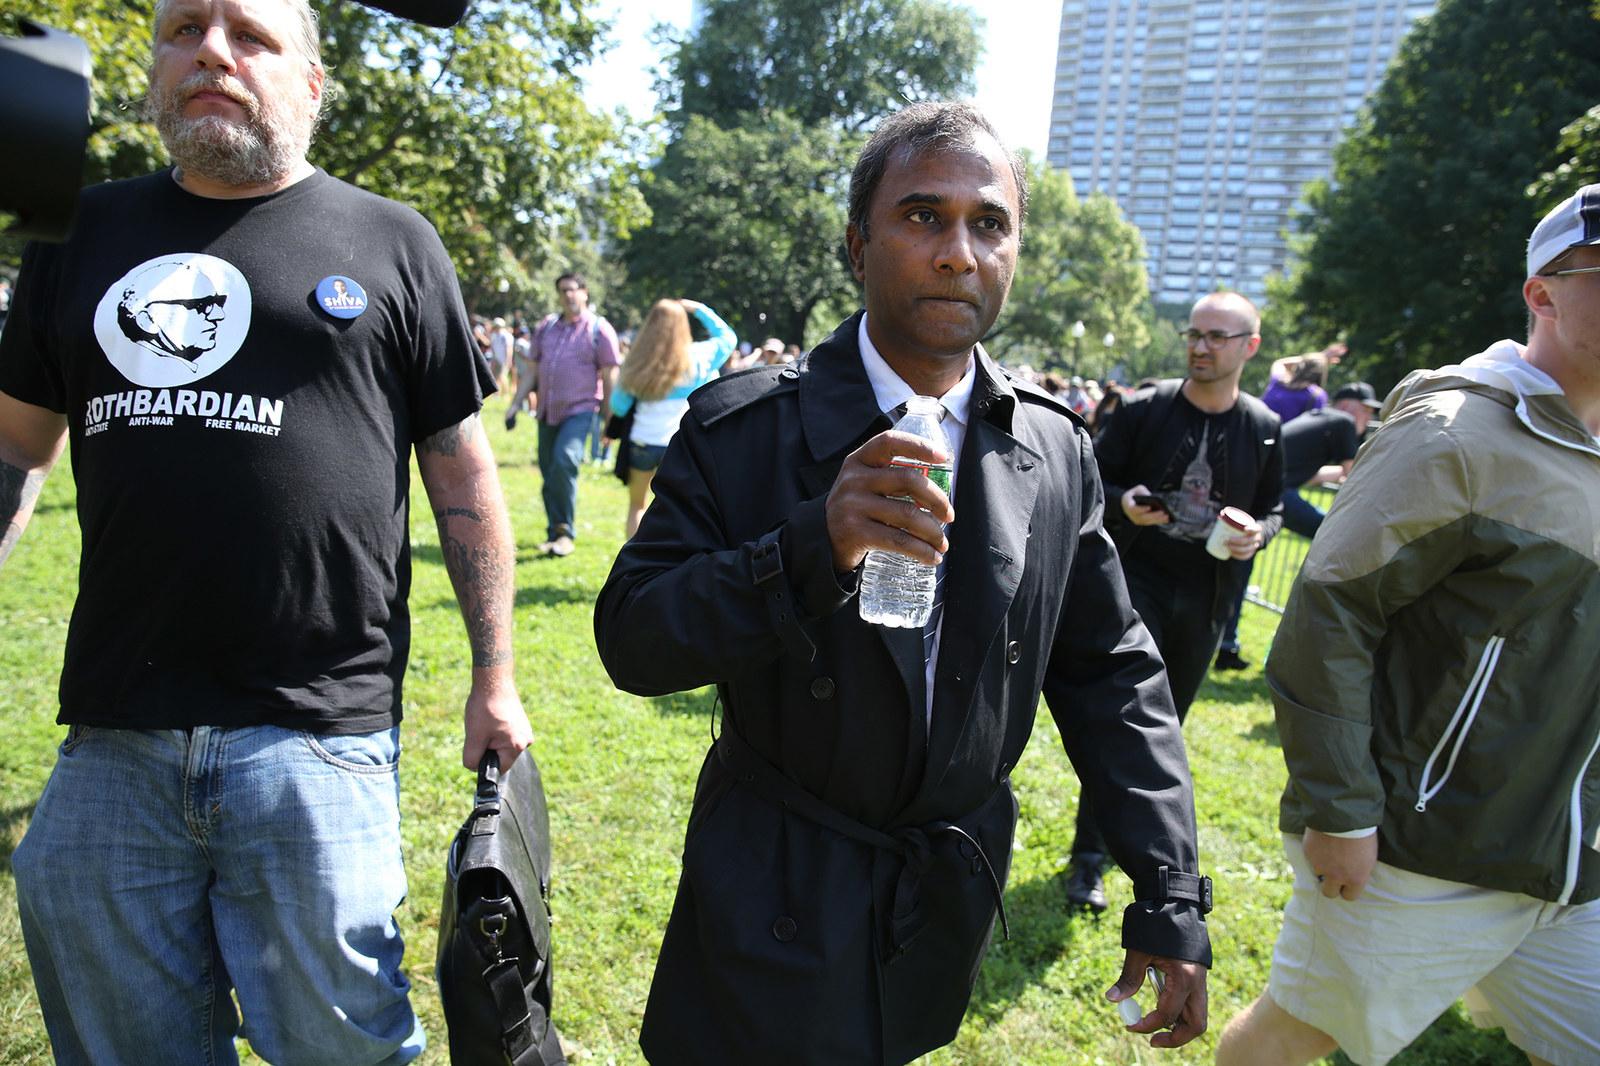 Shiva Ayyadurai (center) makes his way to the Boston Free Speech rally where he was scheduled to speak at the Boston Common, Aug. 19, 2017.